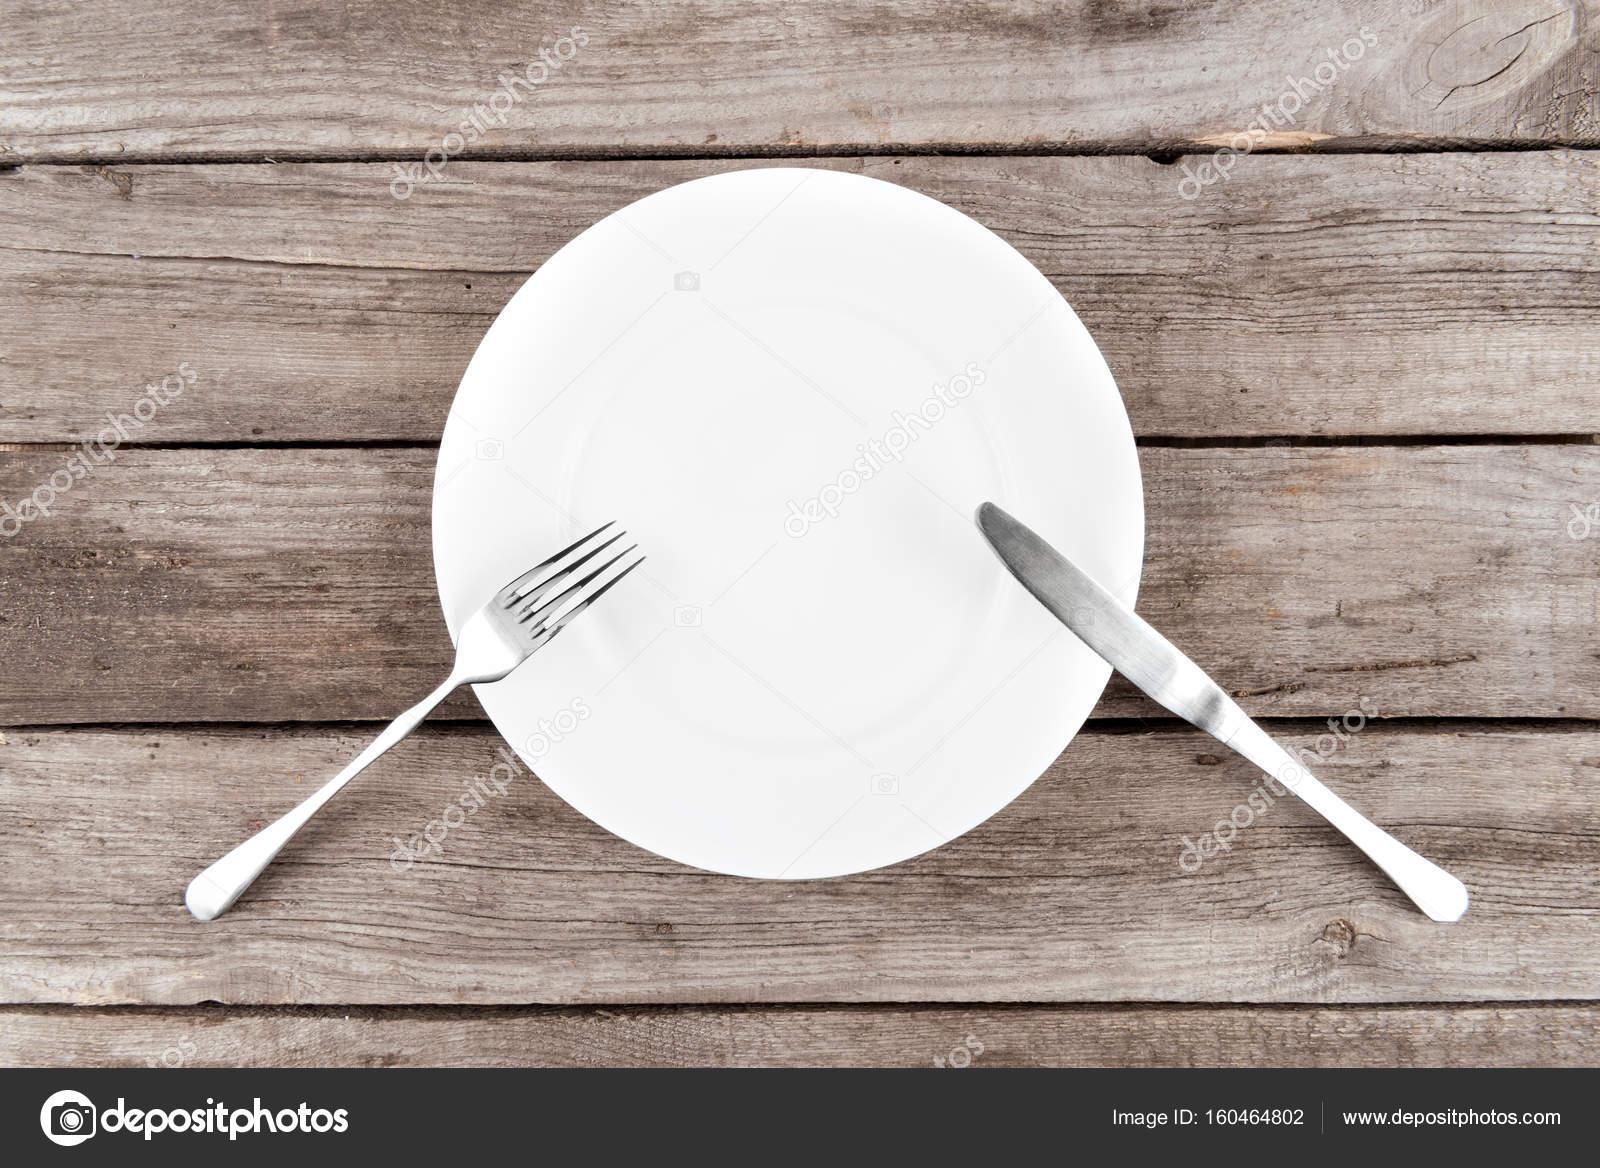 Vaak leeg bord en bestek op tafel — Stockfoto © AntonMatyukha #160464802 #NH75